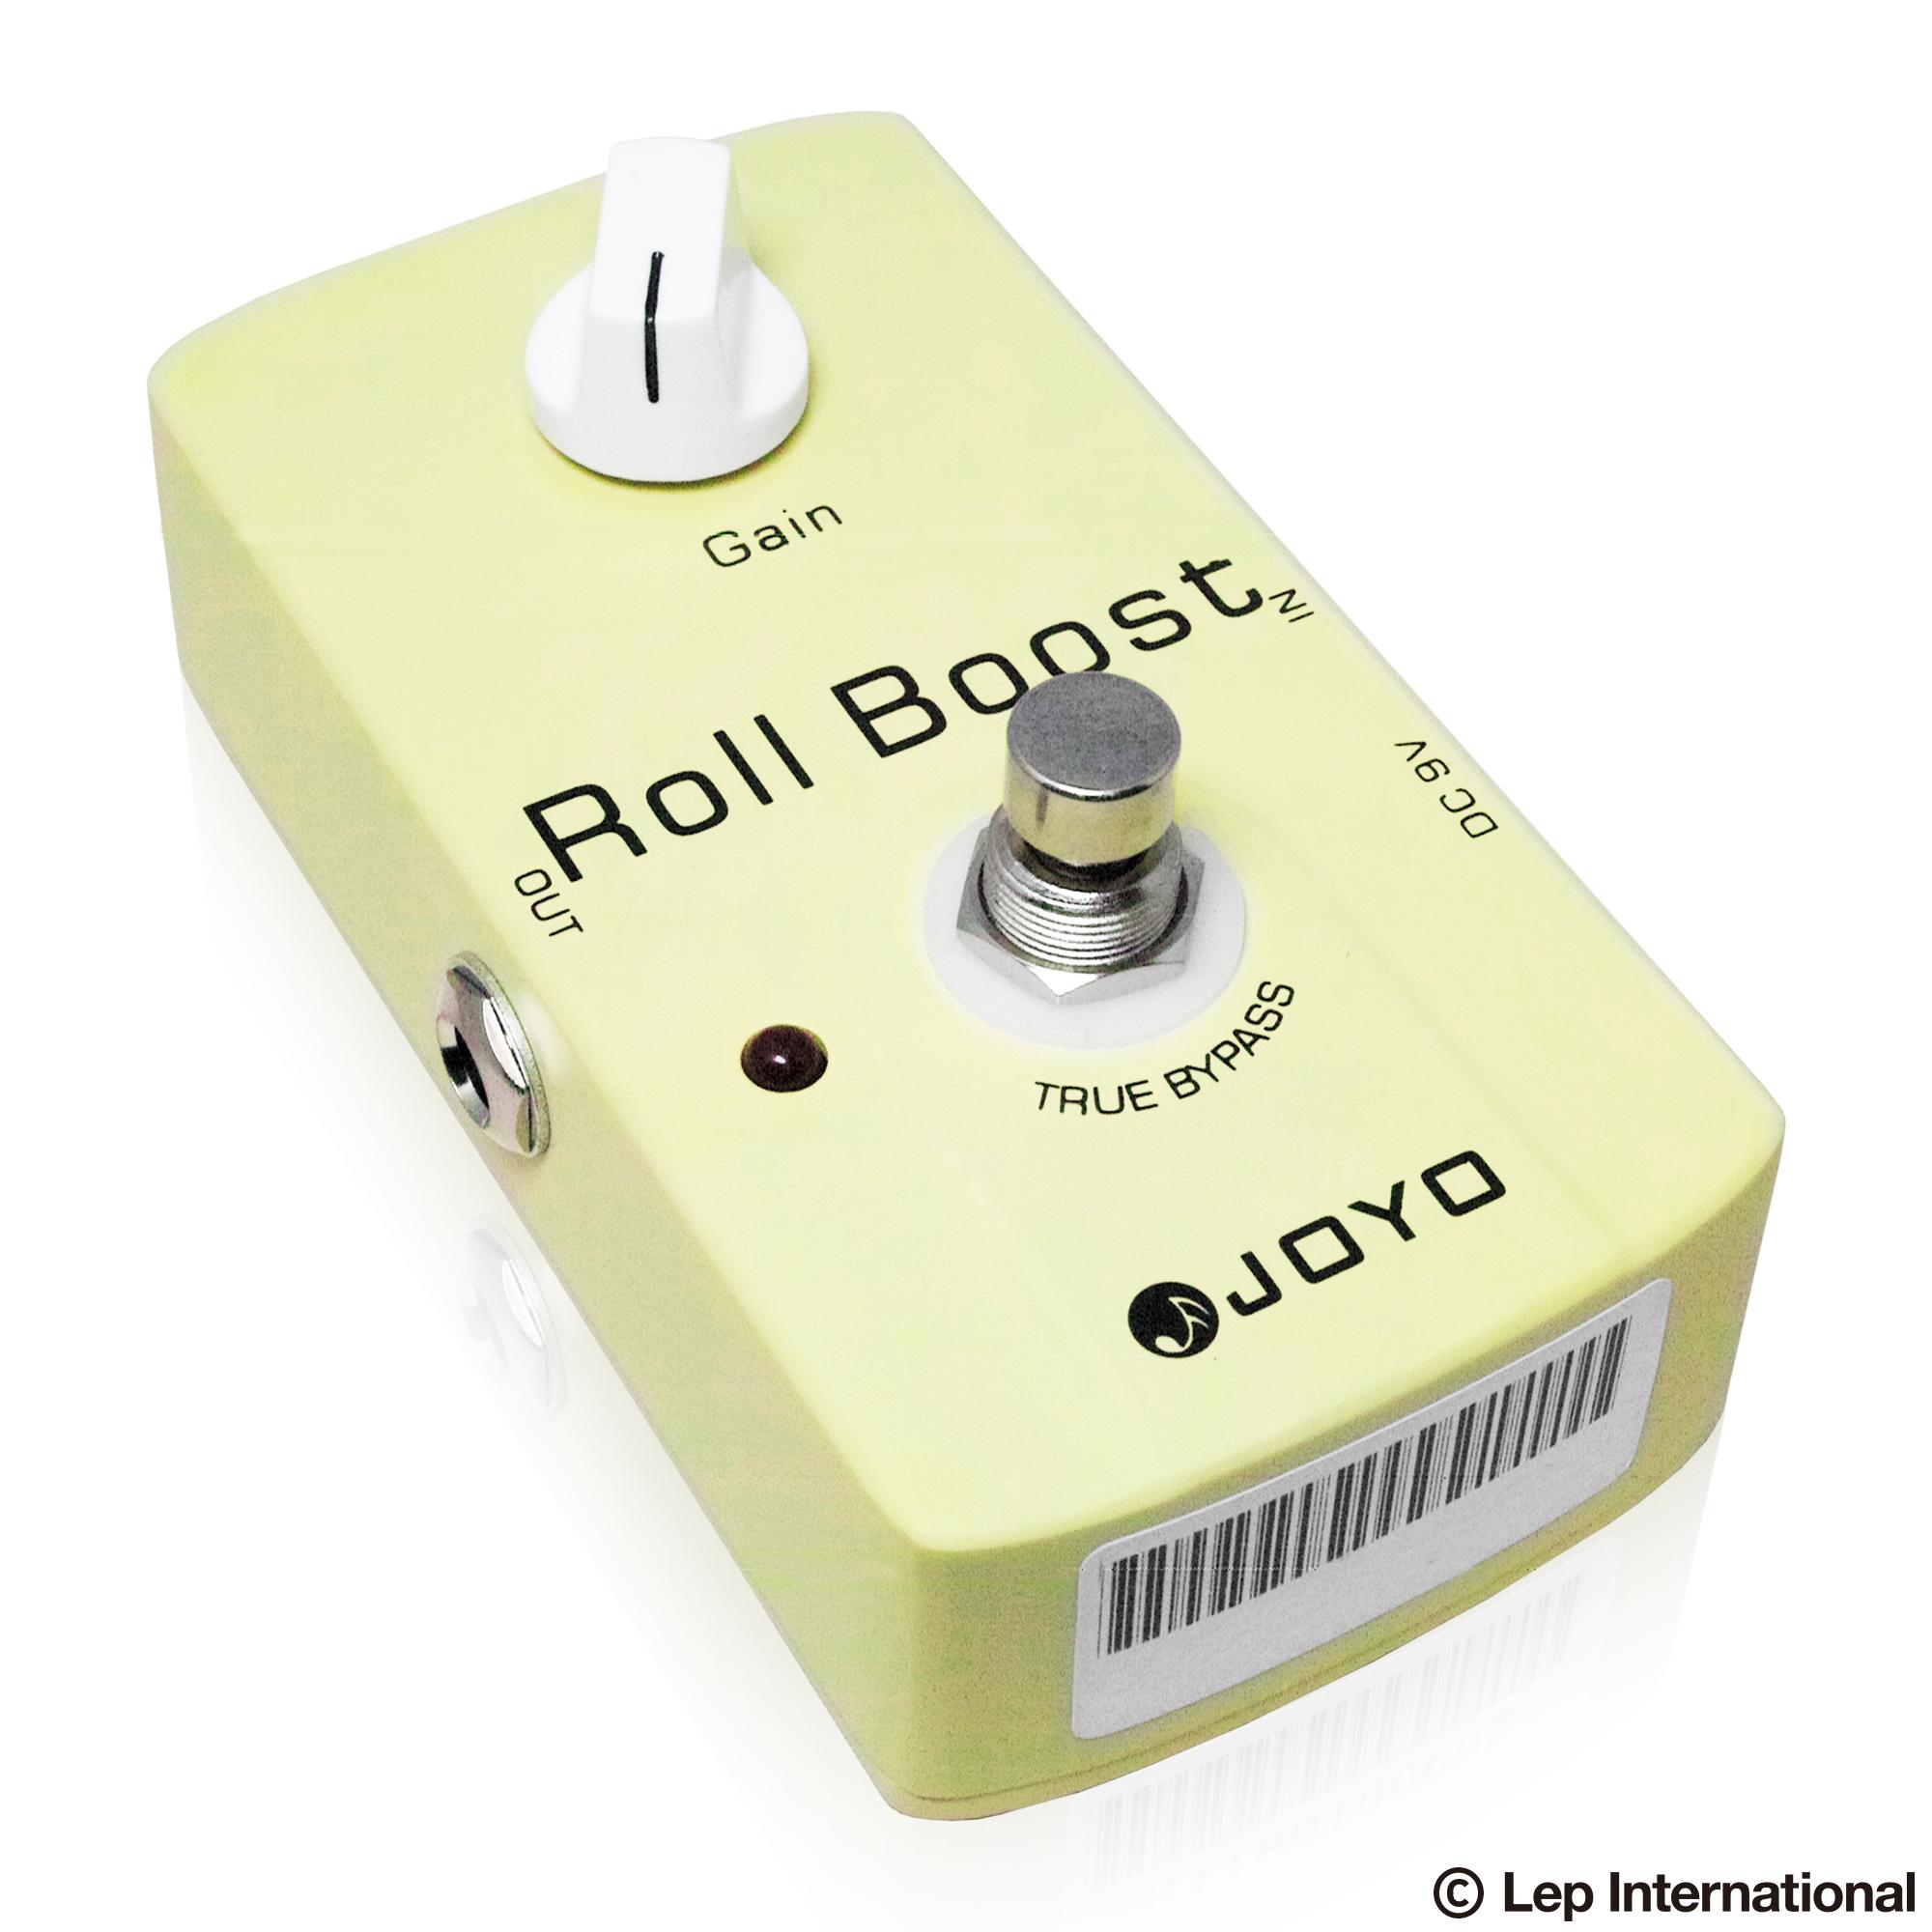 Roll-Boost-03.jpg